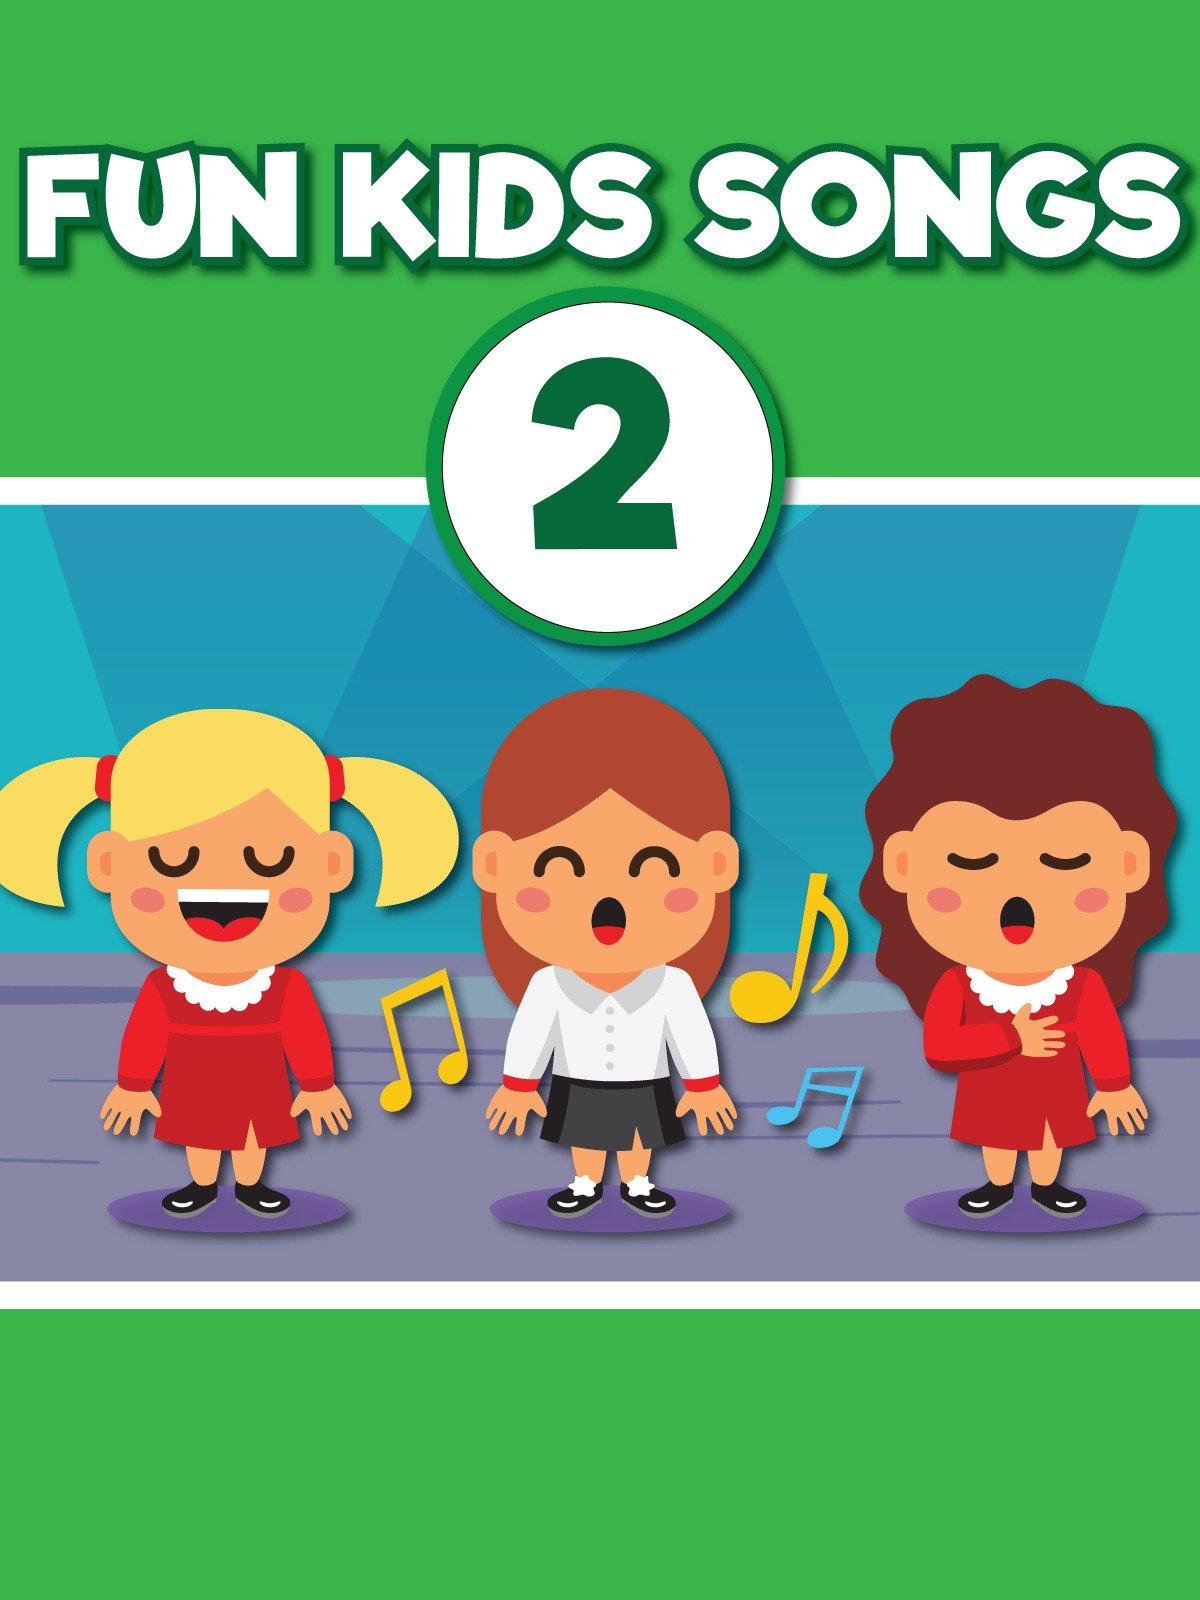 Fun Kids Songs 2 on Amazon Prime Video UK